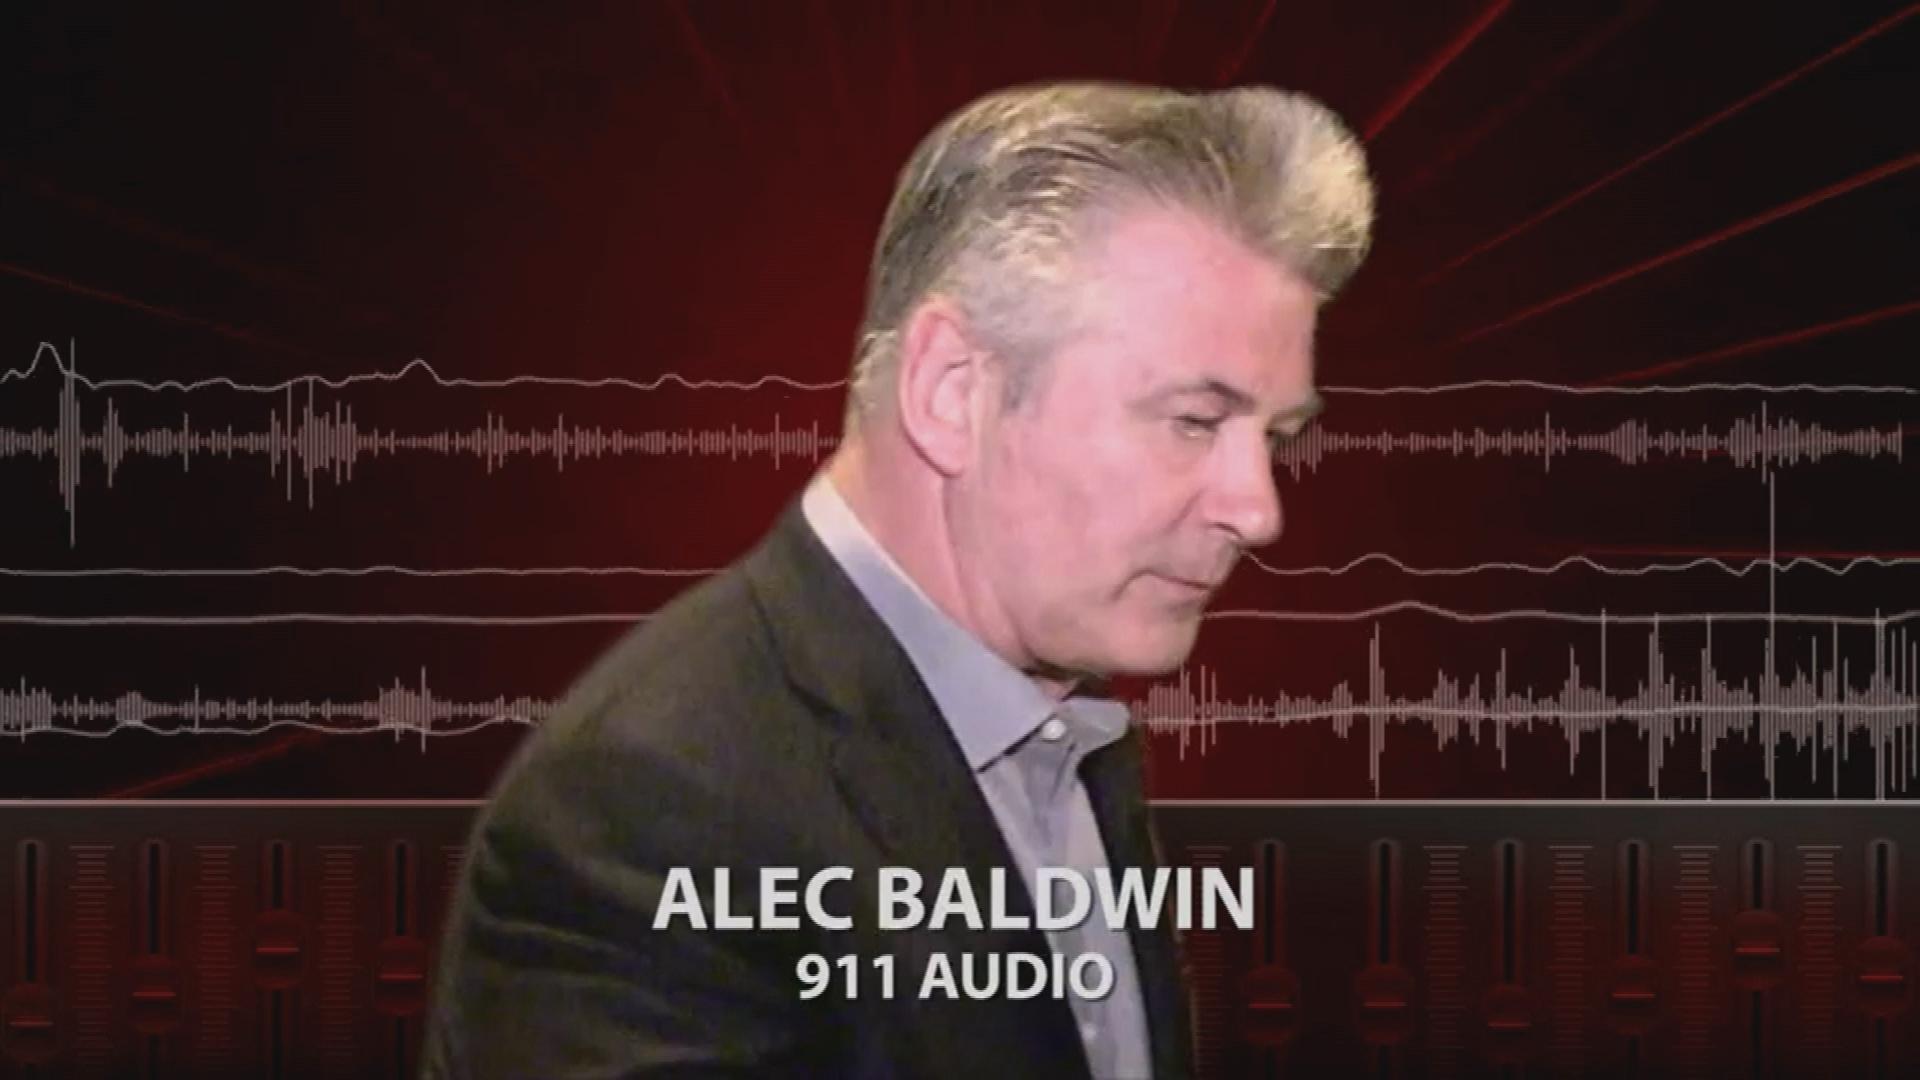 Emergency call audio released after fatal prop gun shooting on Alec Baldwin movie set